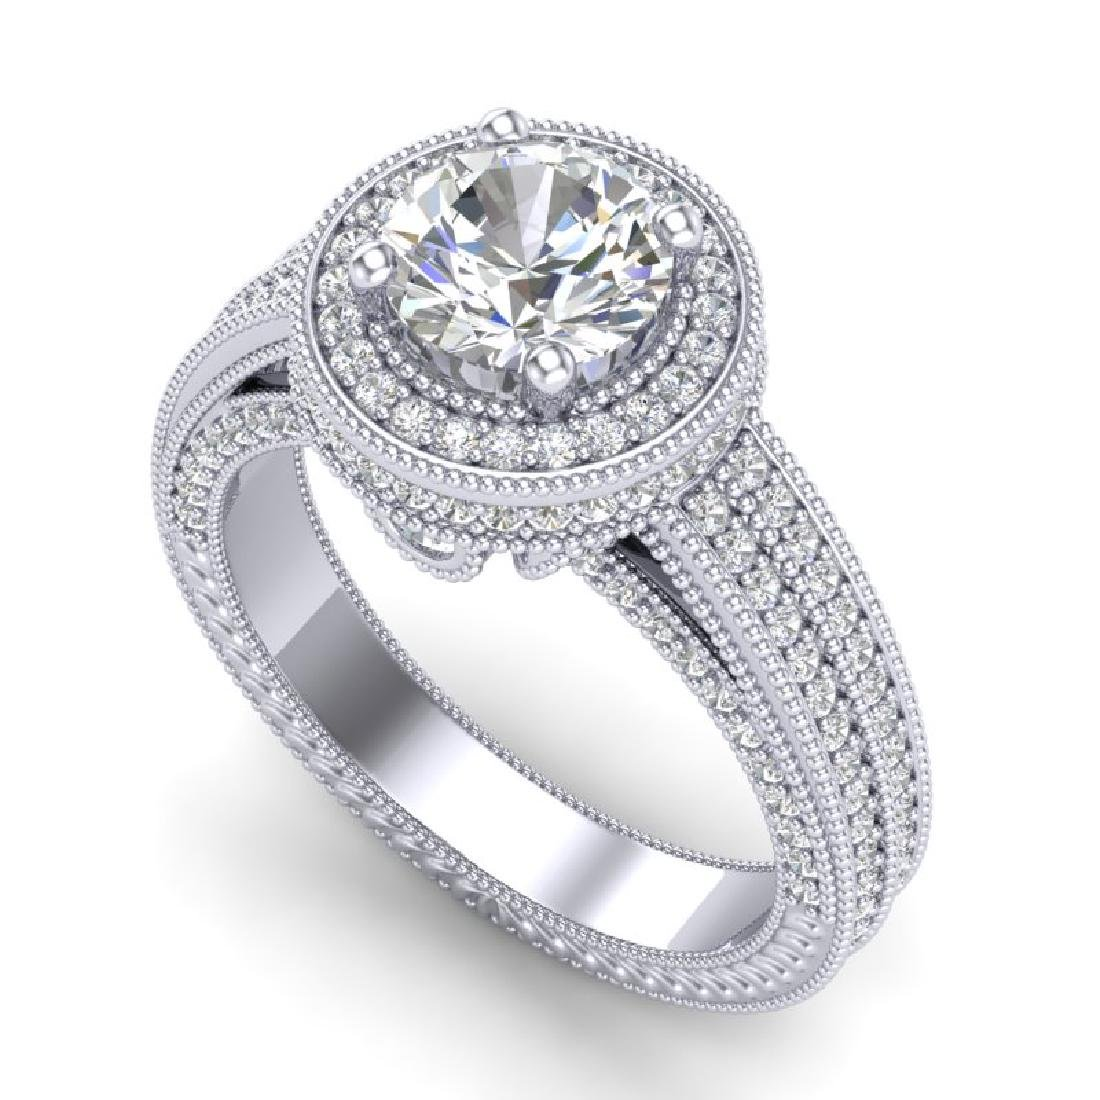 2.8 CTW VS/SI Diamond Solitaire Art Deco Ring 18K White